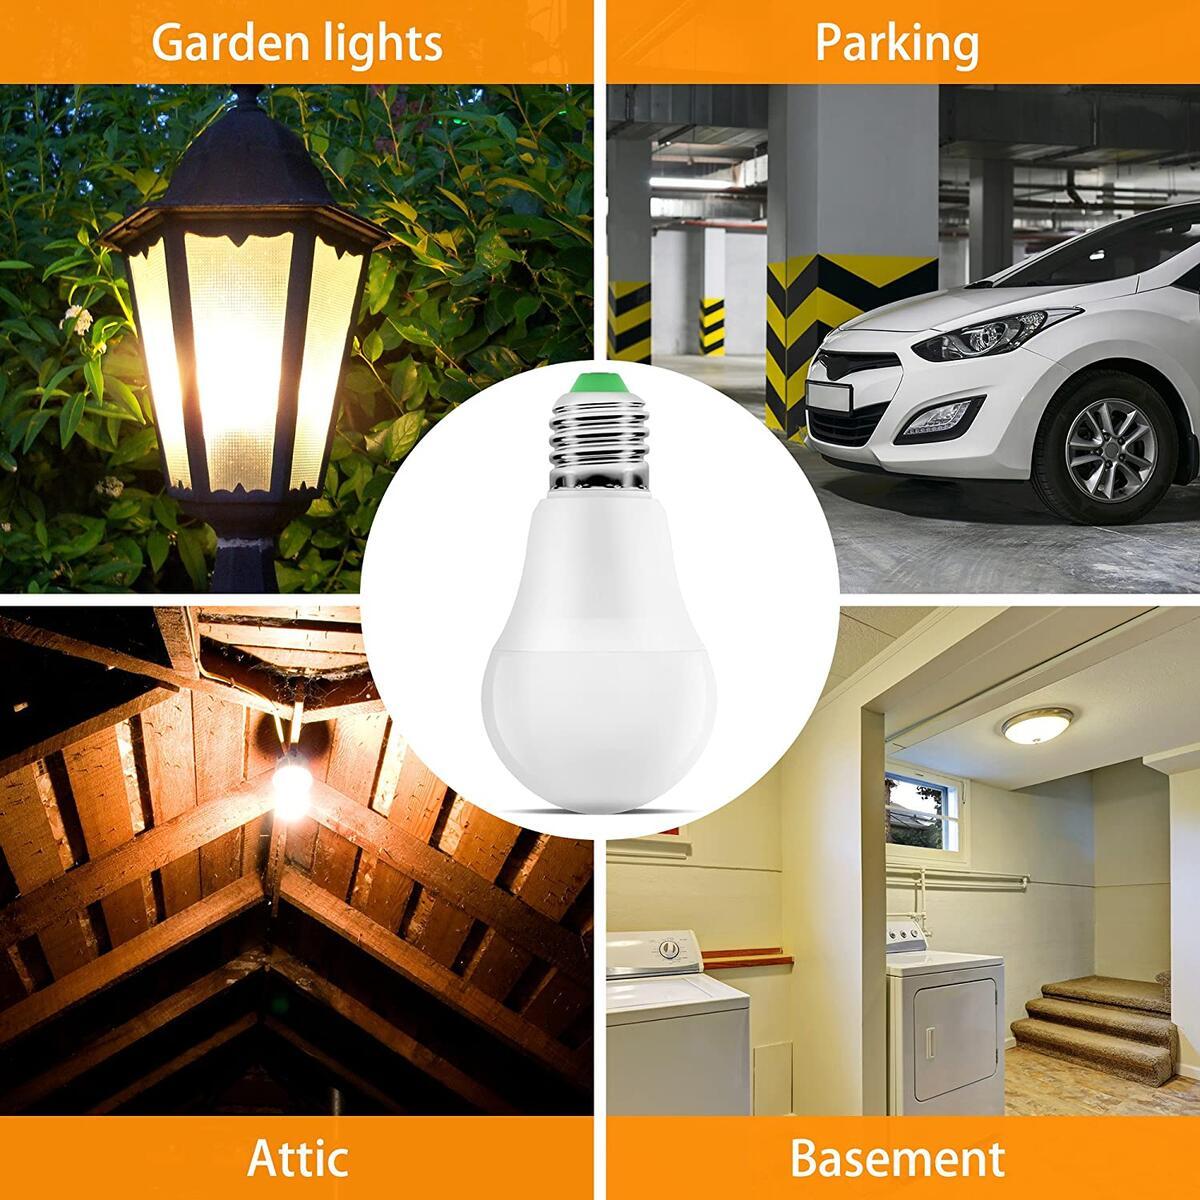 Motion Sensor Light Bulb Outdoor - 9W 4000k Dusk to Dawn Light Bulb Radar - Motion Sensor Porch LED Motion Activated Outdoor Light Detector for Garage Basement Stairwell Indoor Hallway